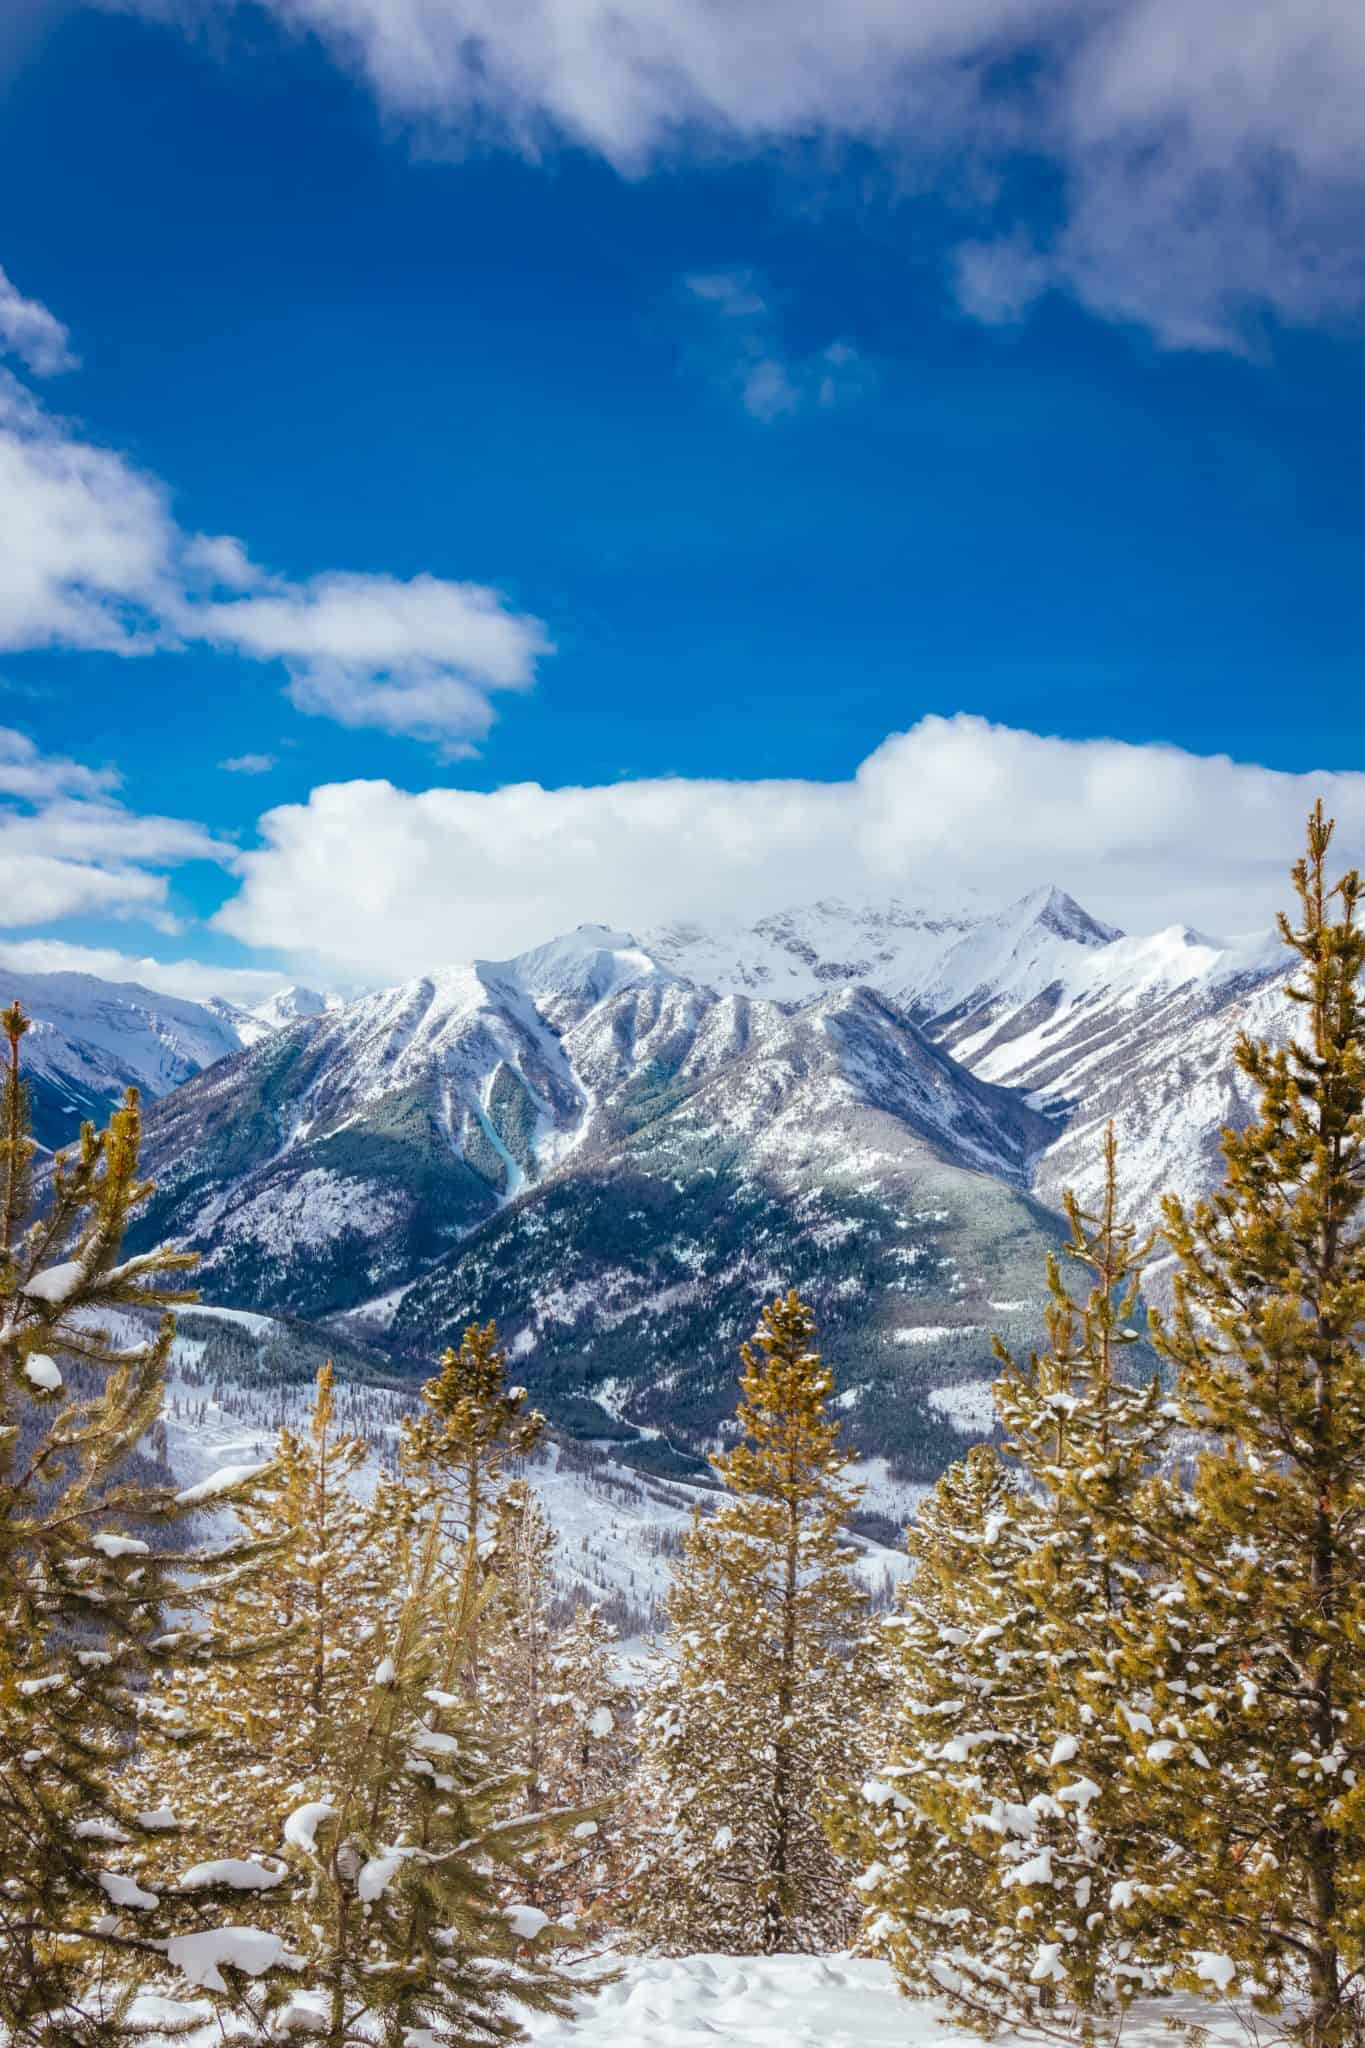 Panorama - Canadian Rockies Ski Resorts